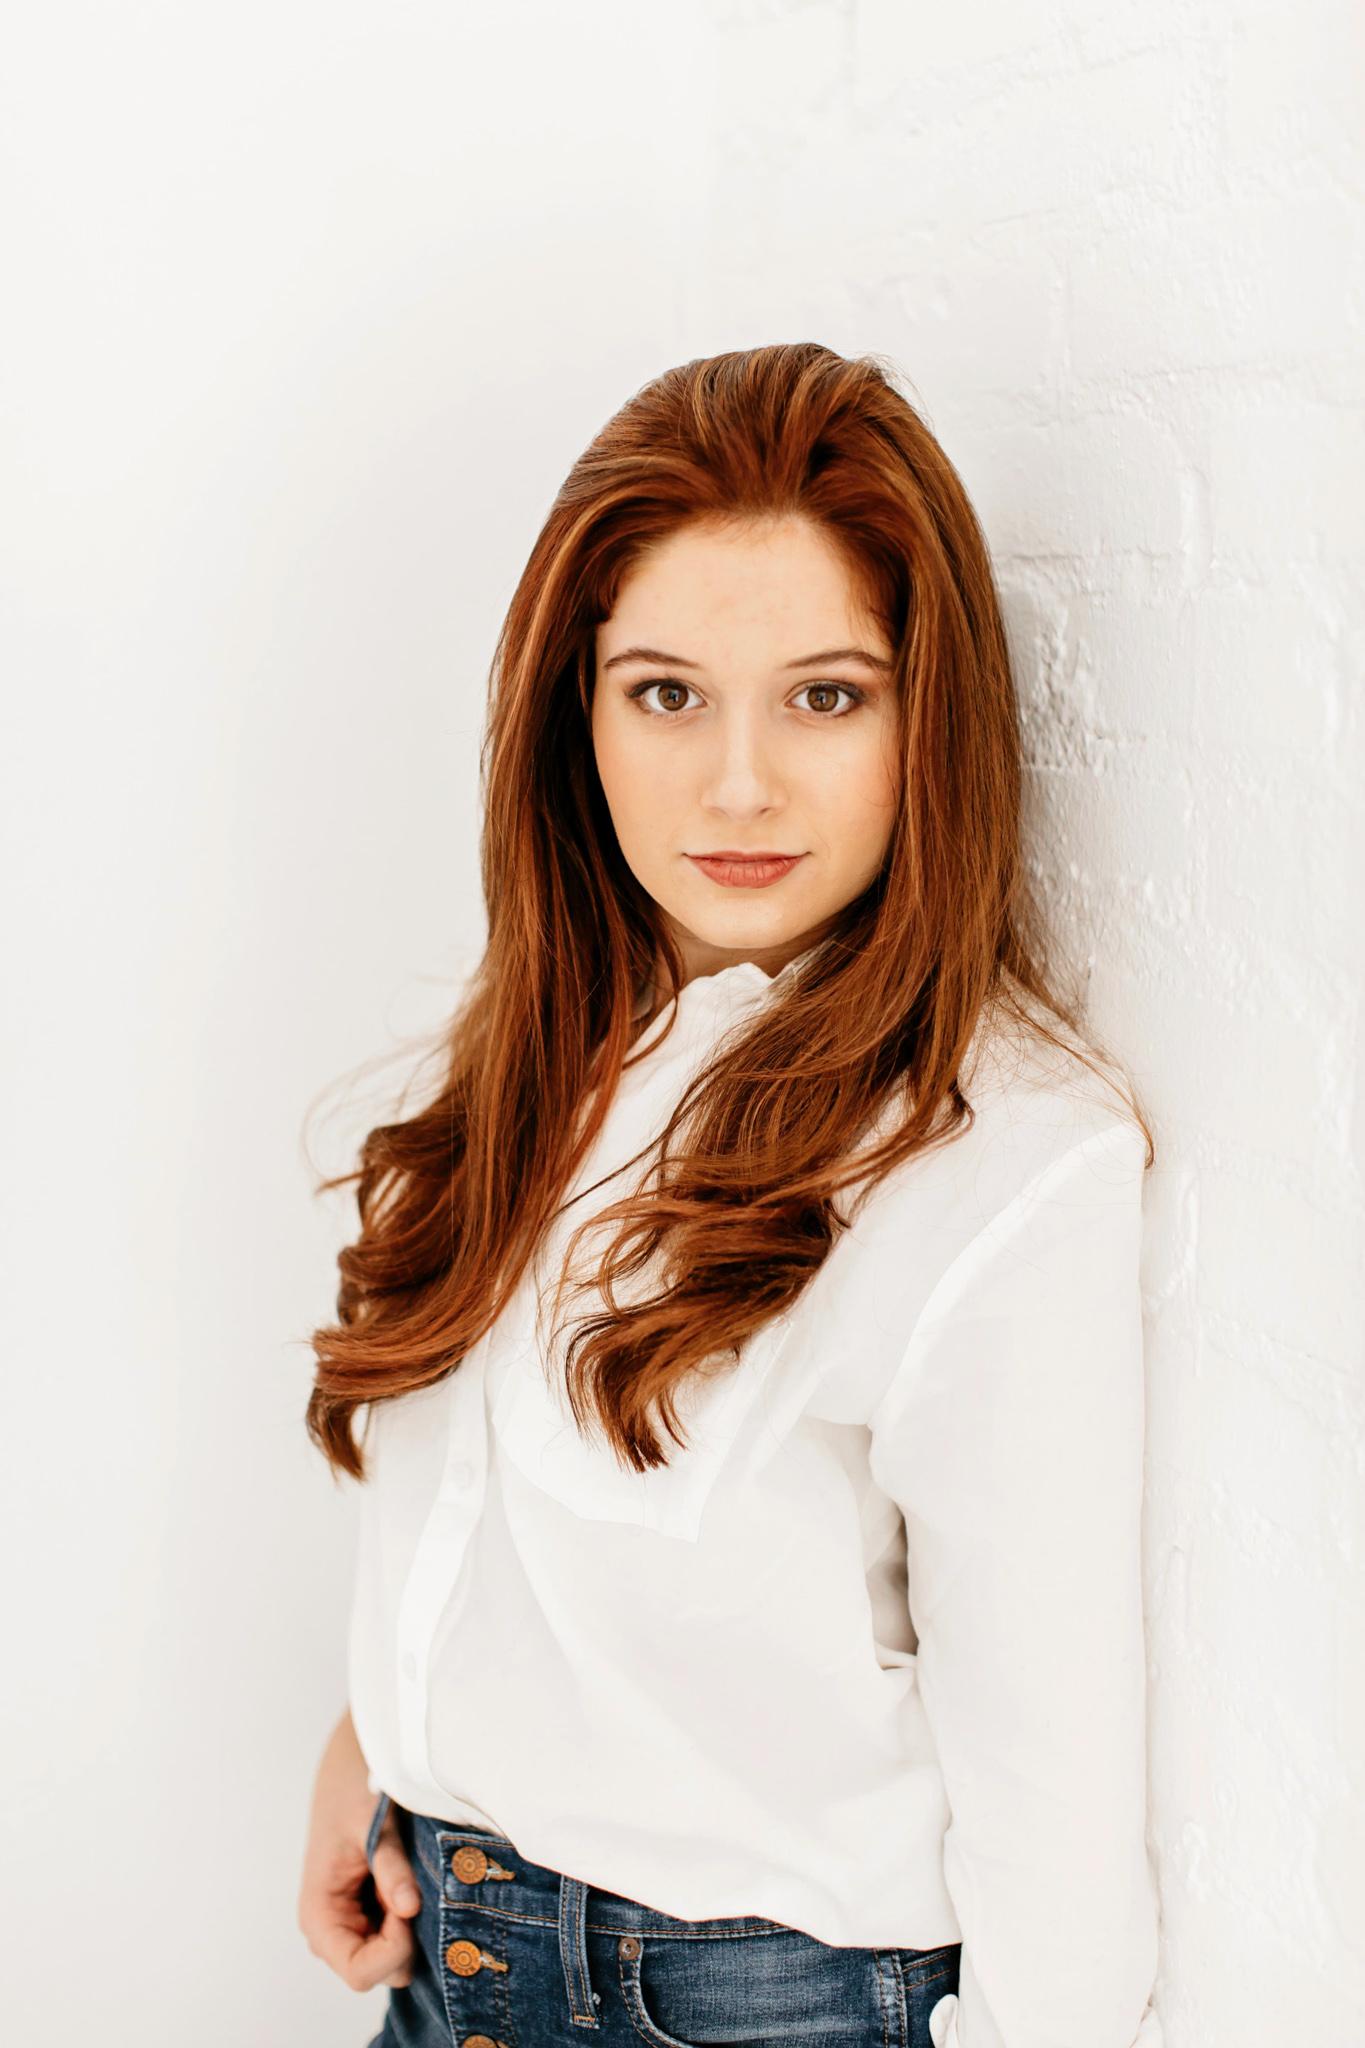 Alexa-Vossler-Photo_Dallas-Portrait-Photographer_ Ashleigh-Smith-Portfolio-Shoot_The-Lumen-Room-13.jpg